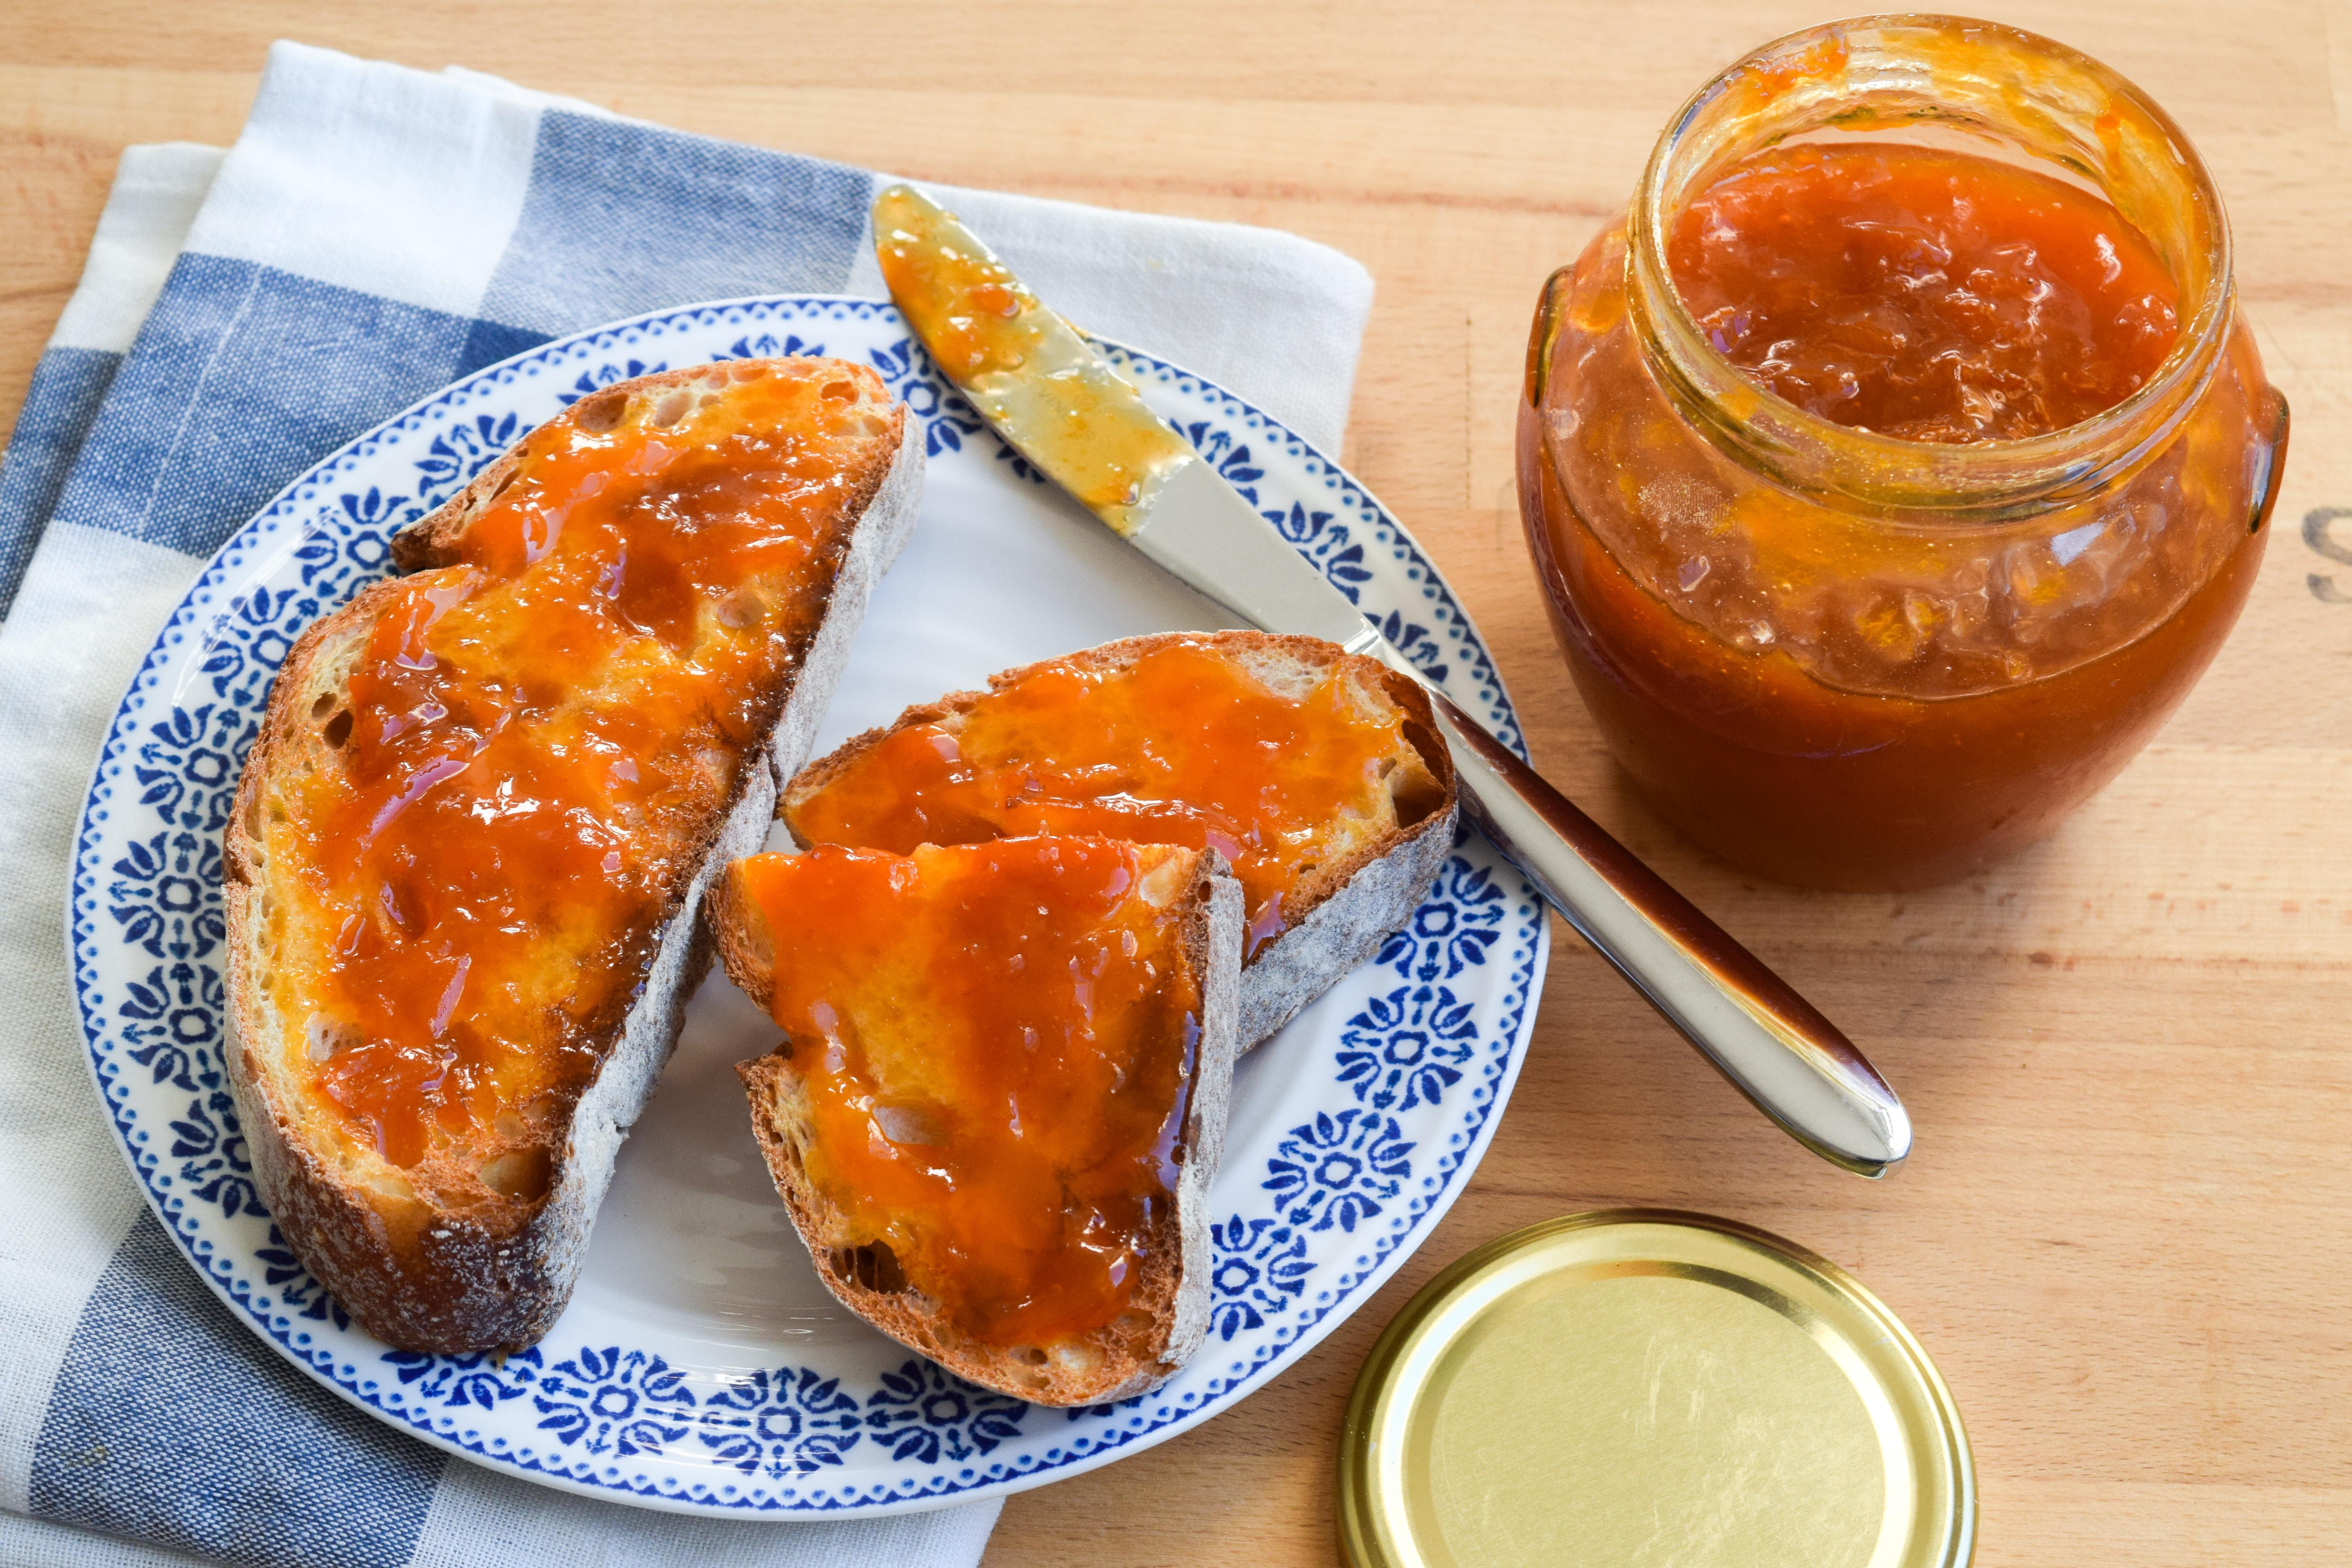 How To Make Homemade Apricot Jam